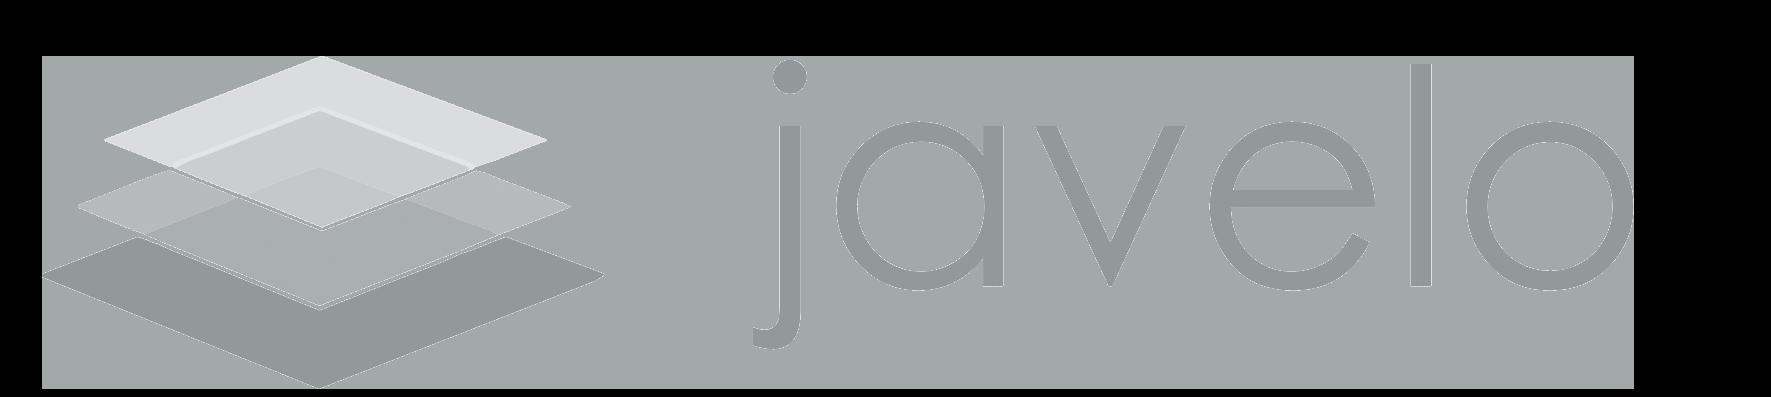 Logo Javelo